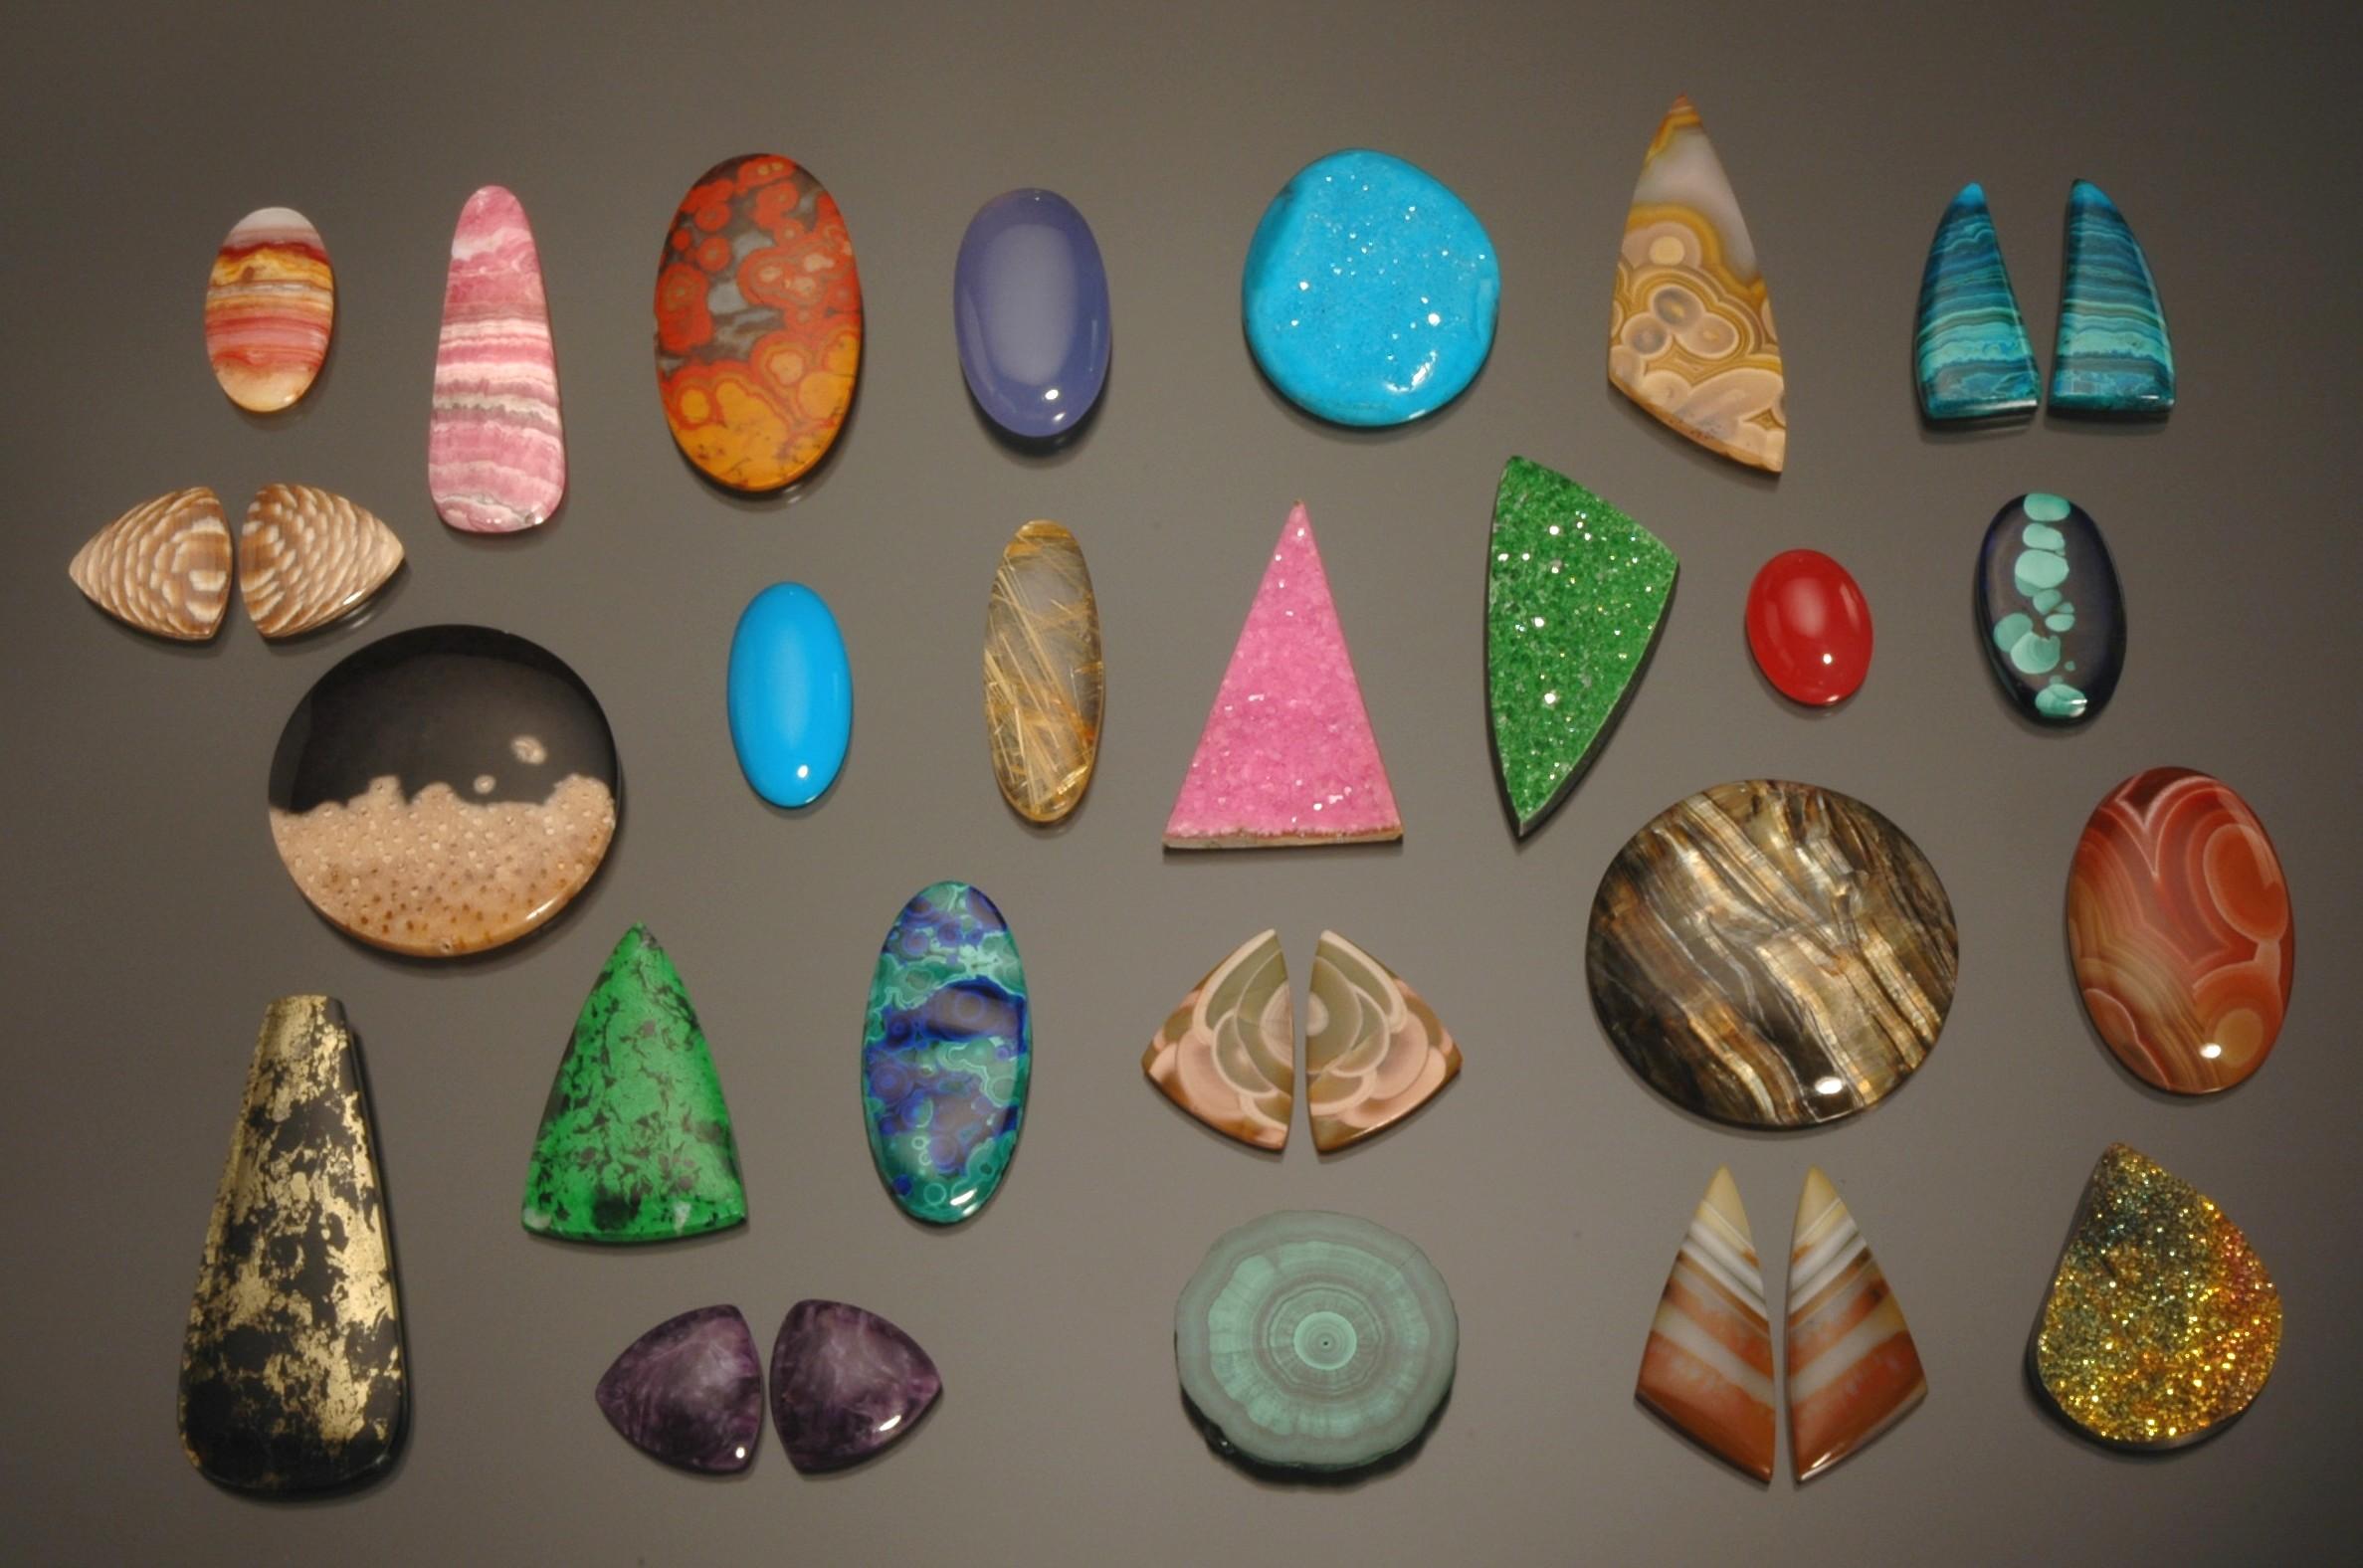 barlows-gems-designer-cabochons-1.jpg